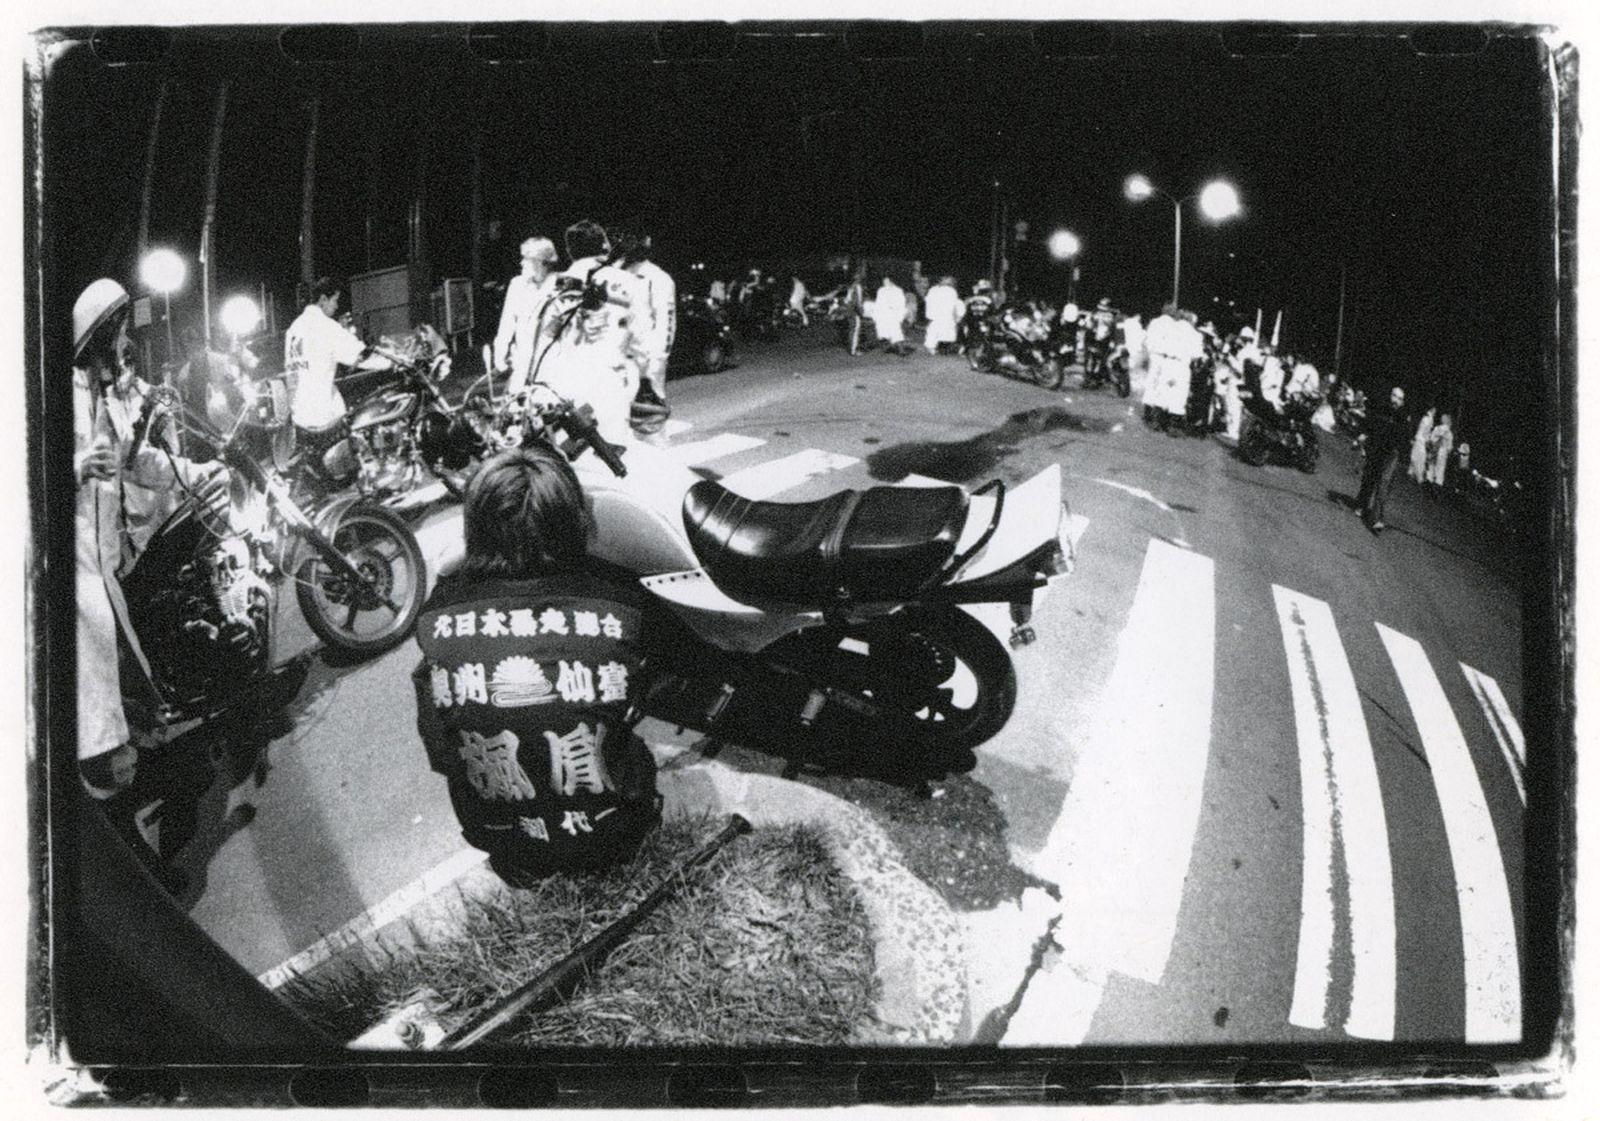 bosozoku-the-stylish-legacy-of-japans-rebel-motorcycle-gangs-13